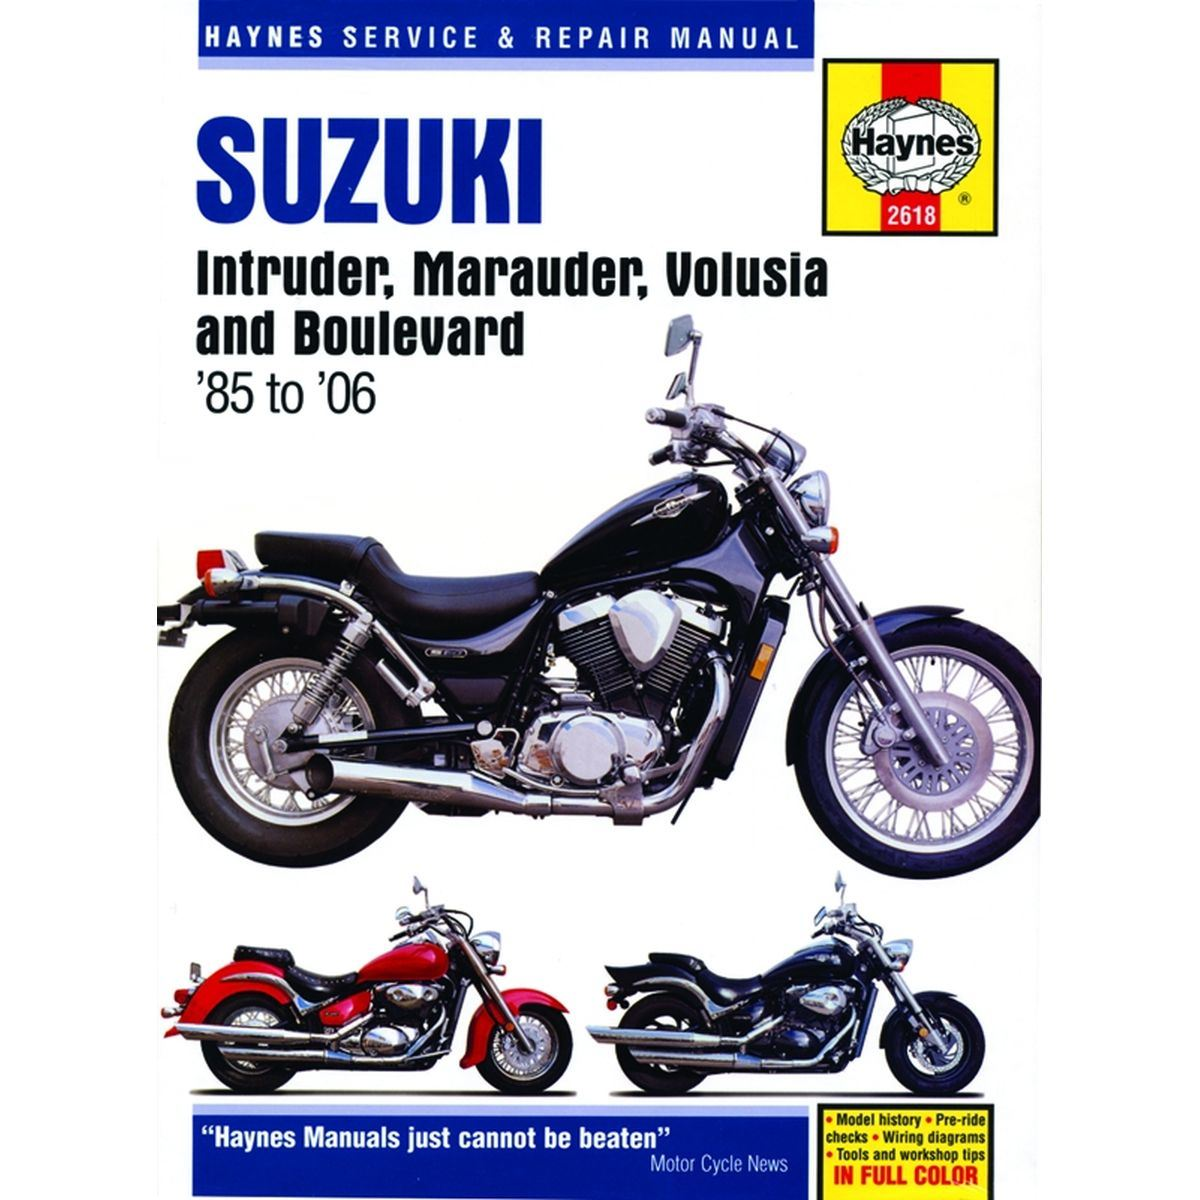 Suzuki Intruder Service Manual Pdf